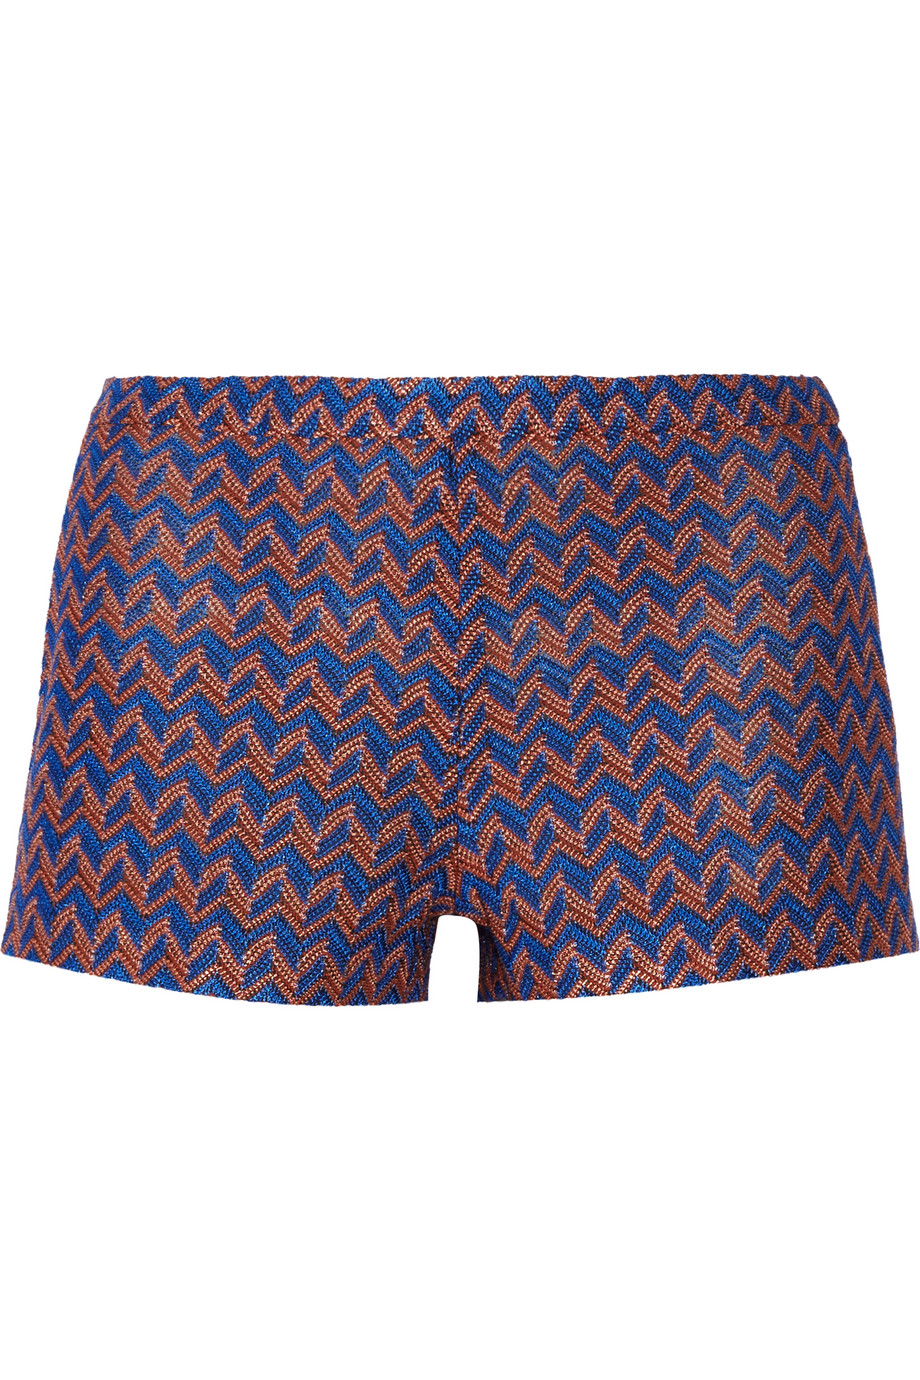 Missoni Crochet-Knit Shorts, Royal Blue, Women's, Size: 36